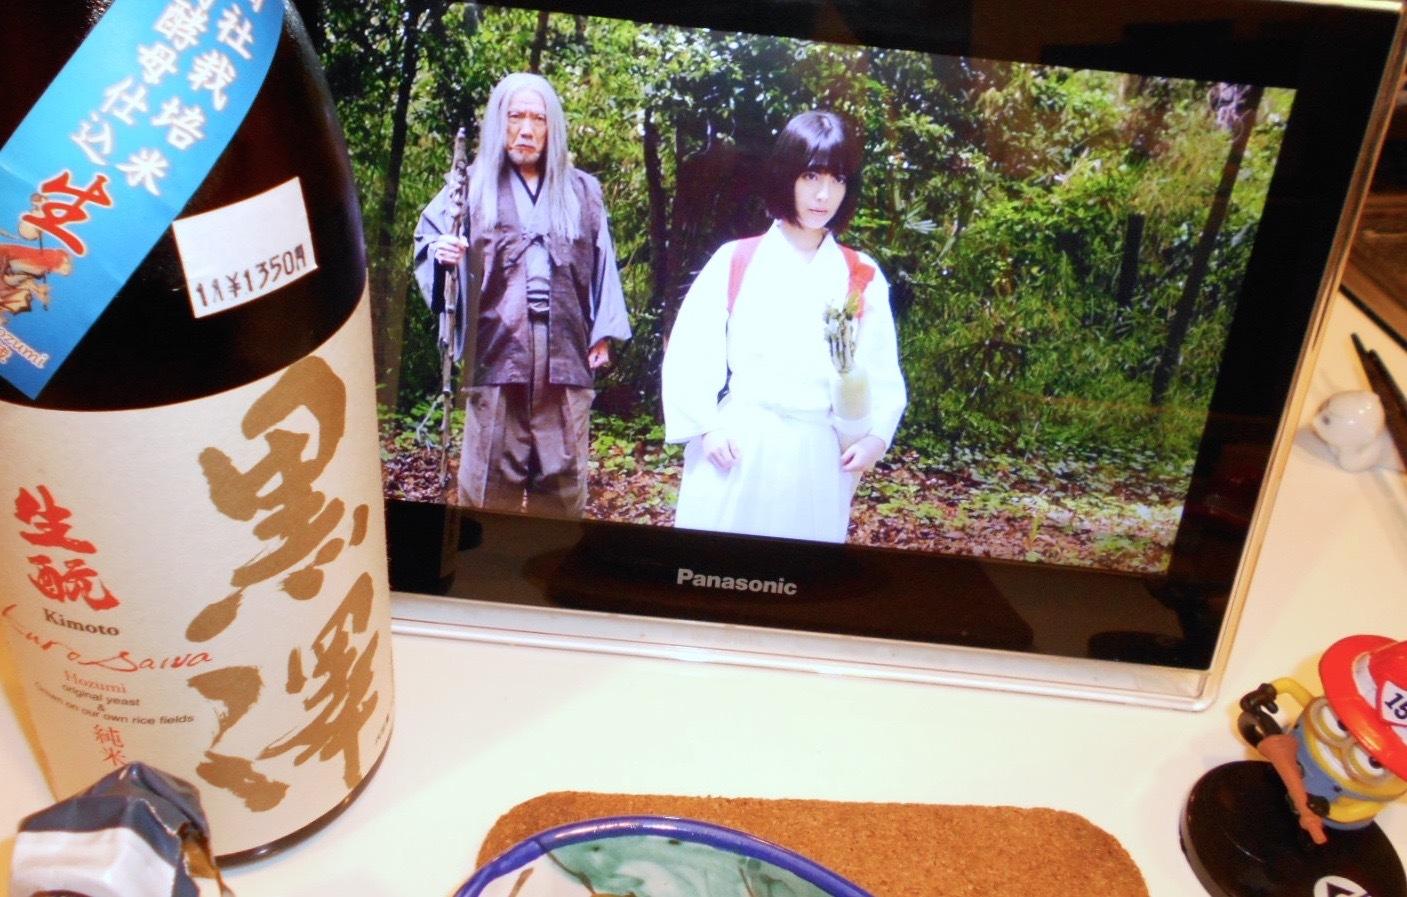 kurosawa_hozumi30by1_3.jpg